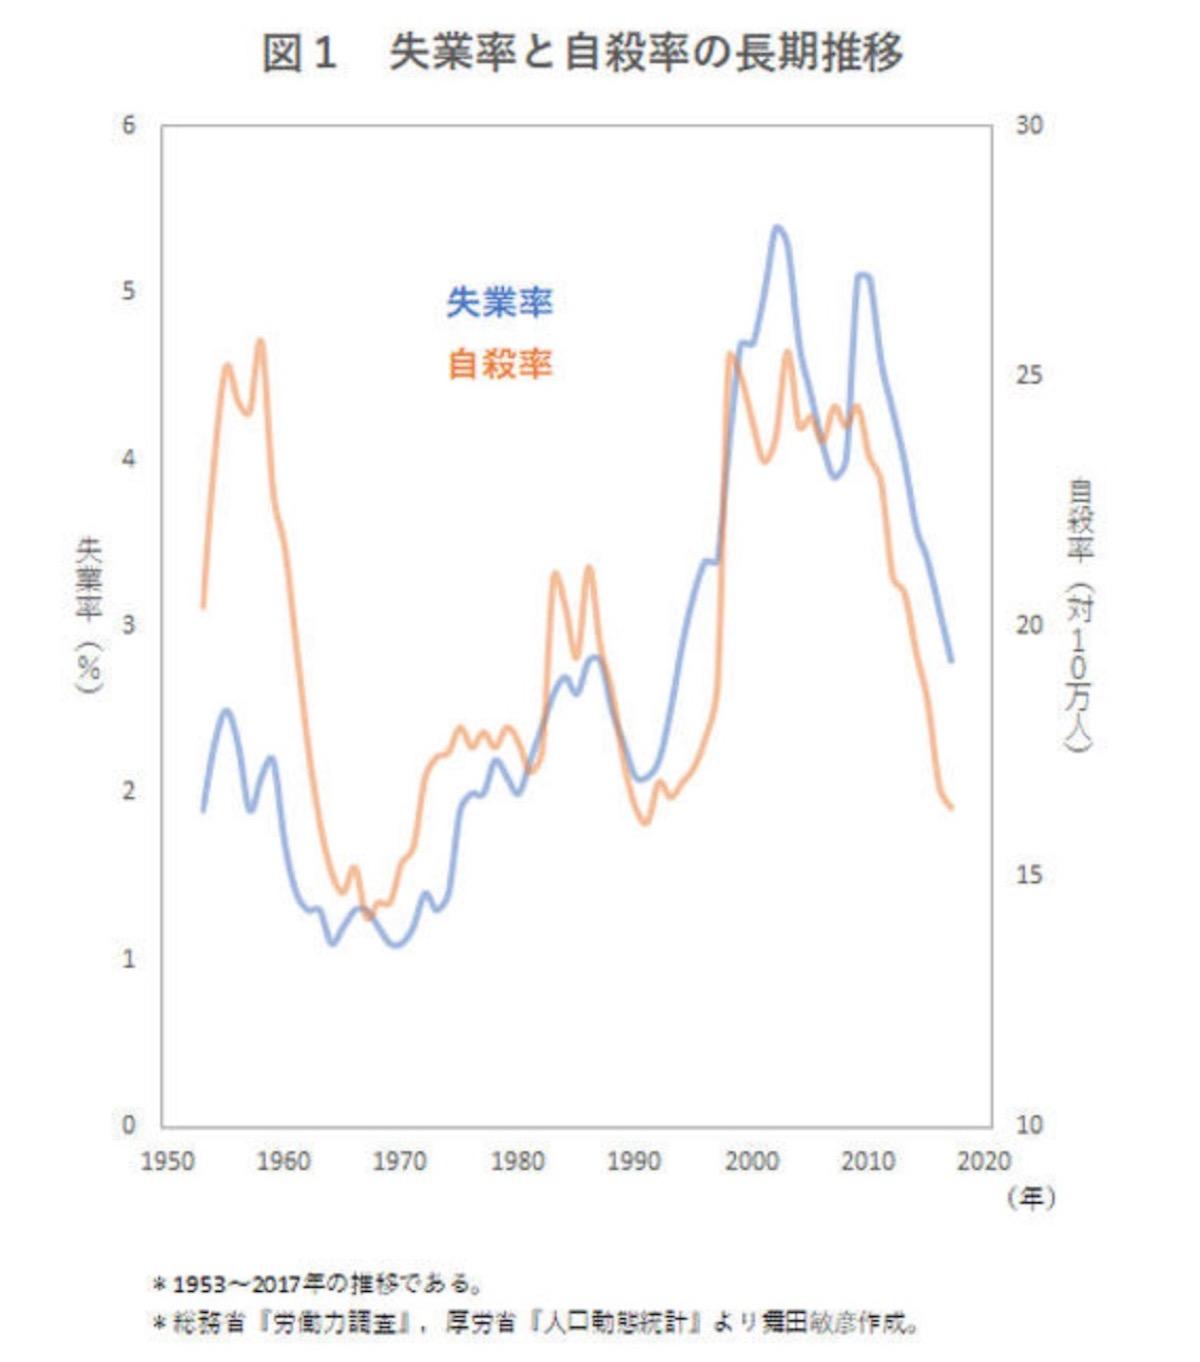 失業率と自殺率の推移 - 澤田康幸東京大学教授調べ